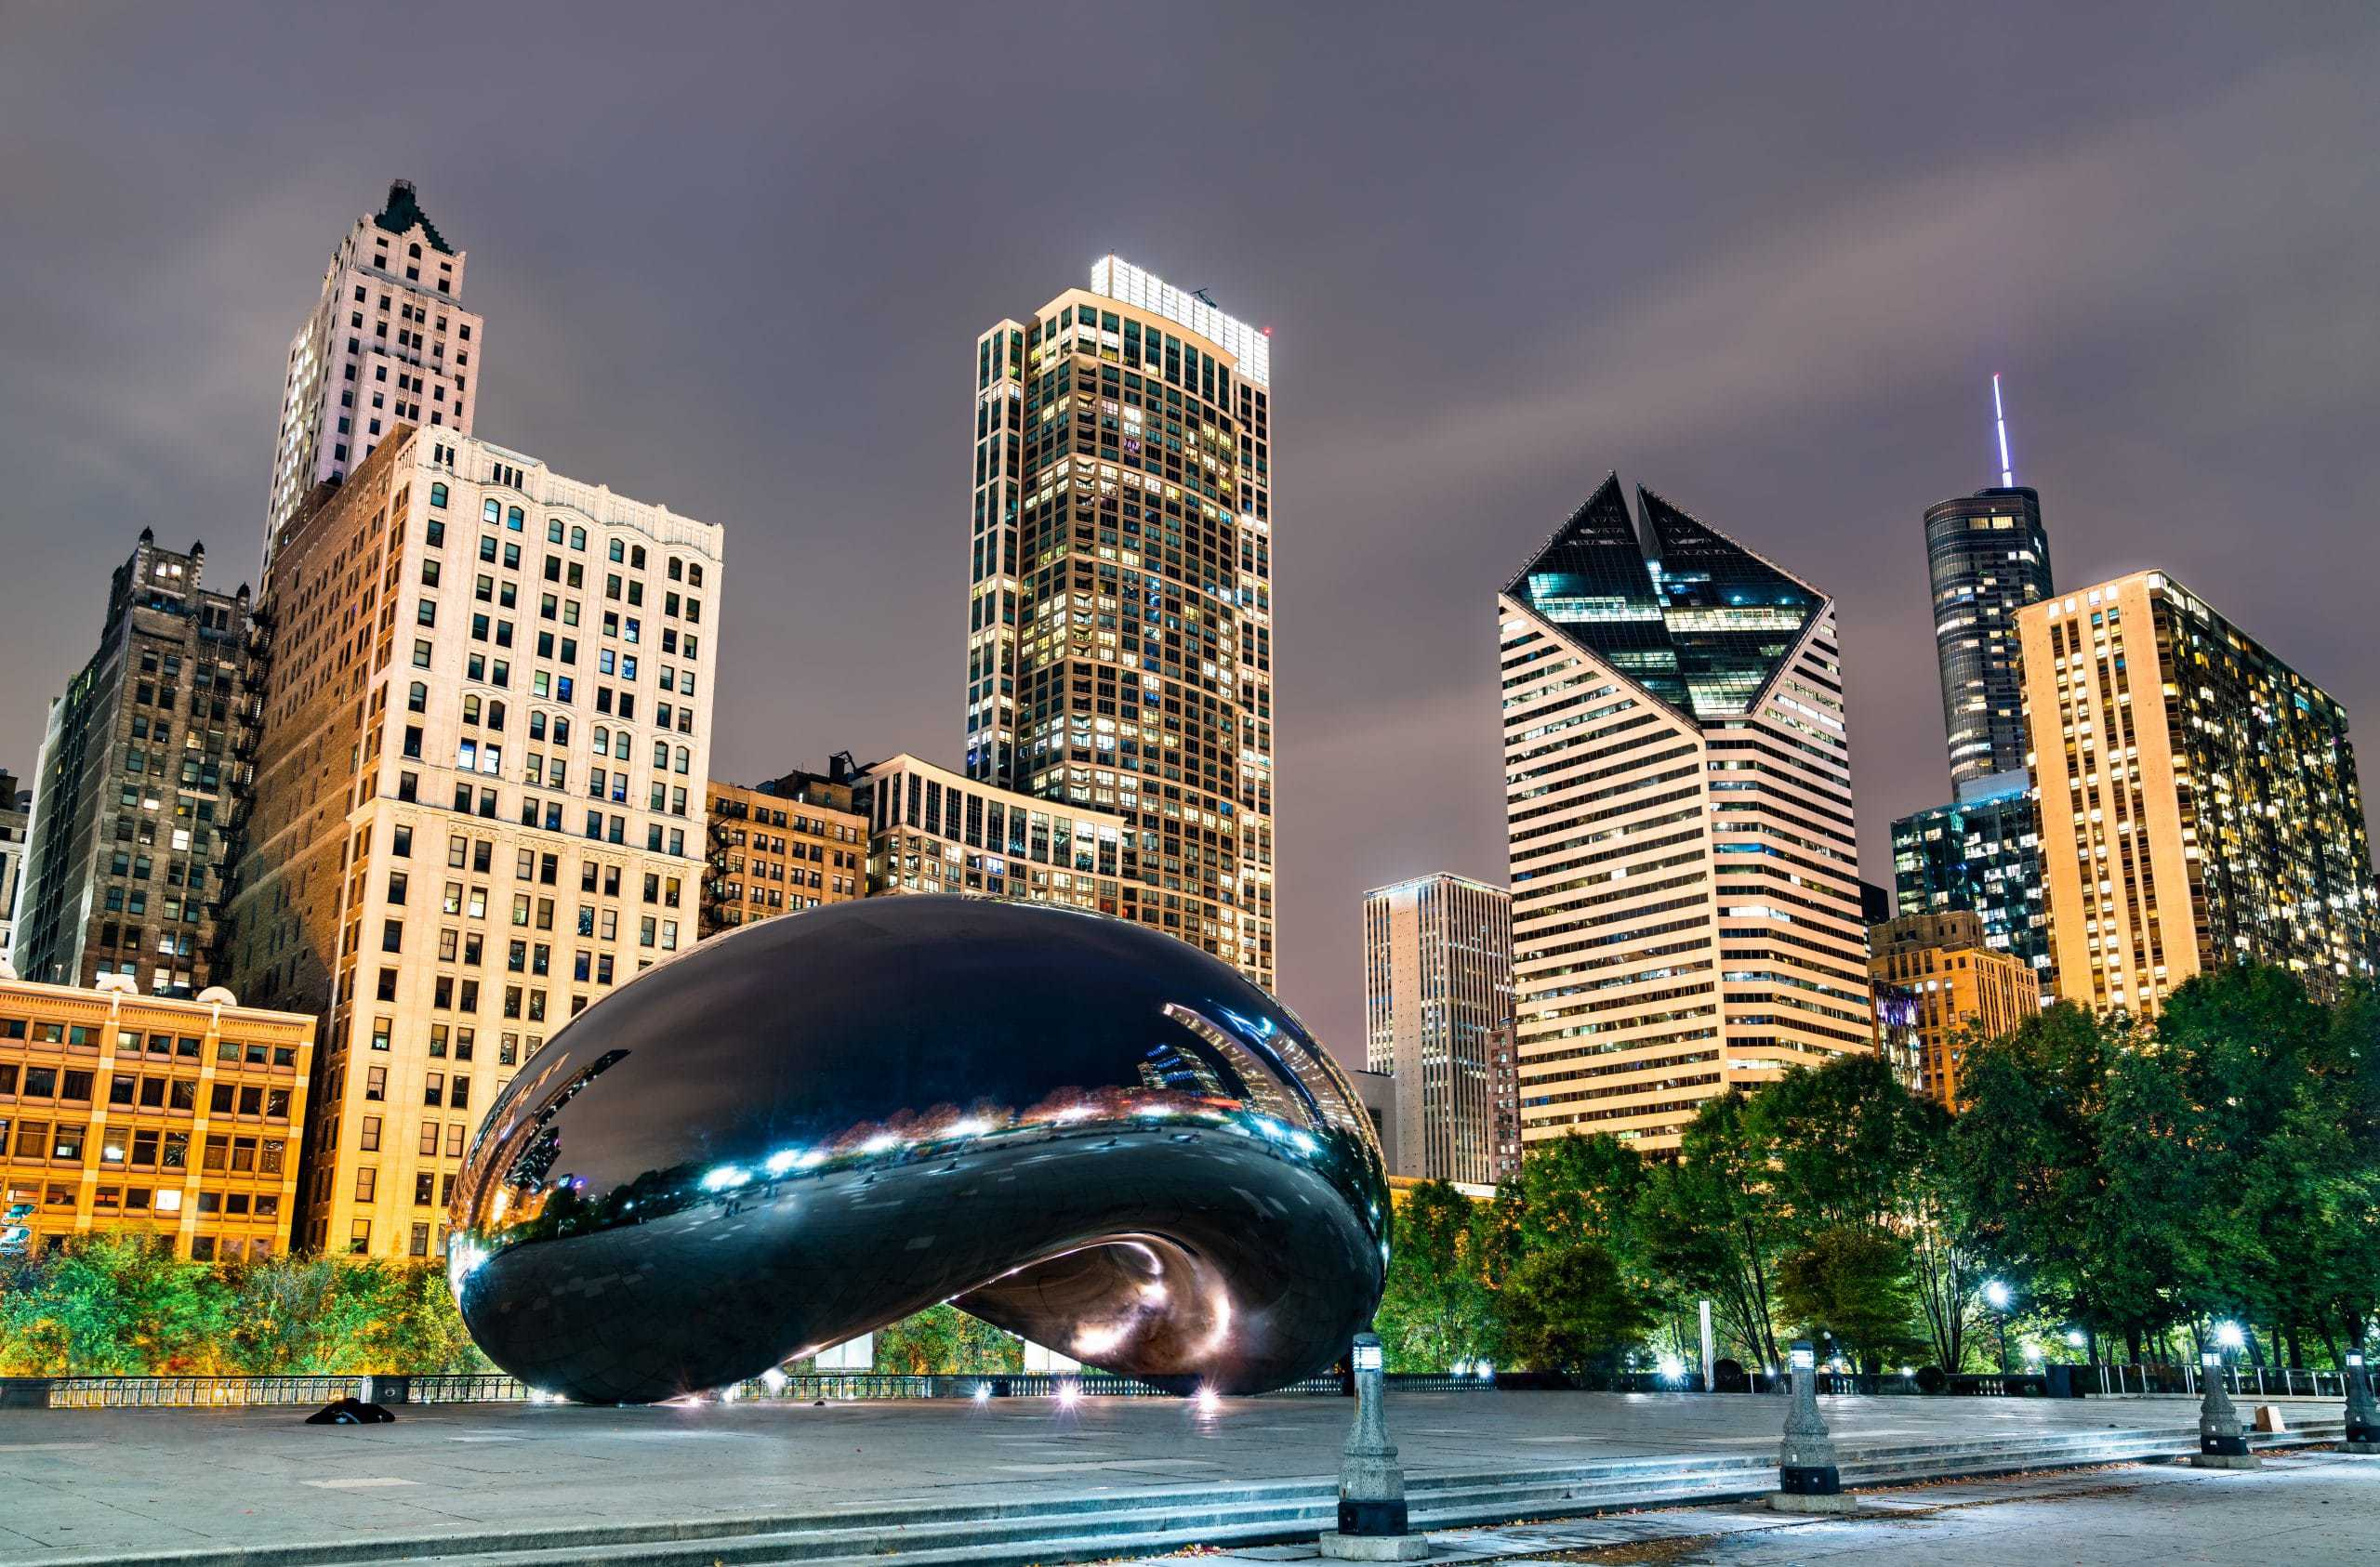 Cloud Gate, a public sculpture at Millennium Park in Chicago, USA